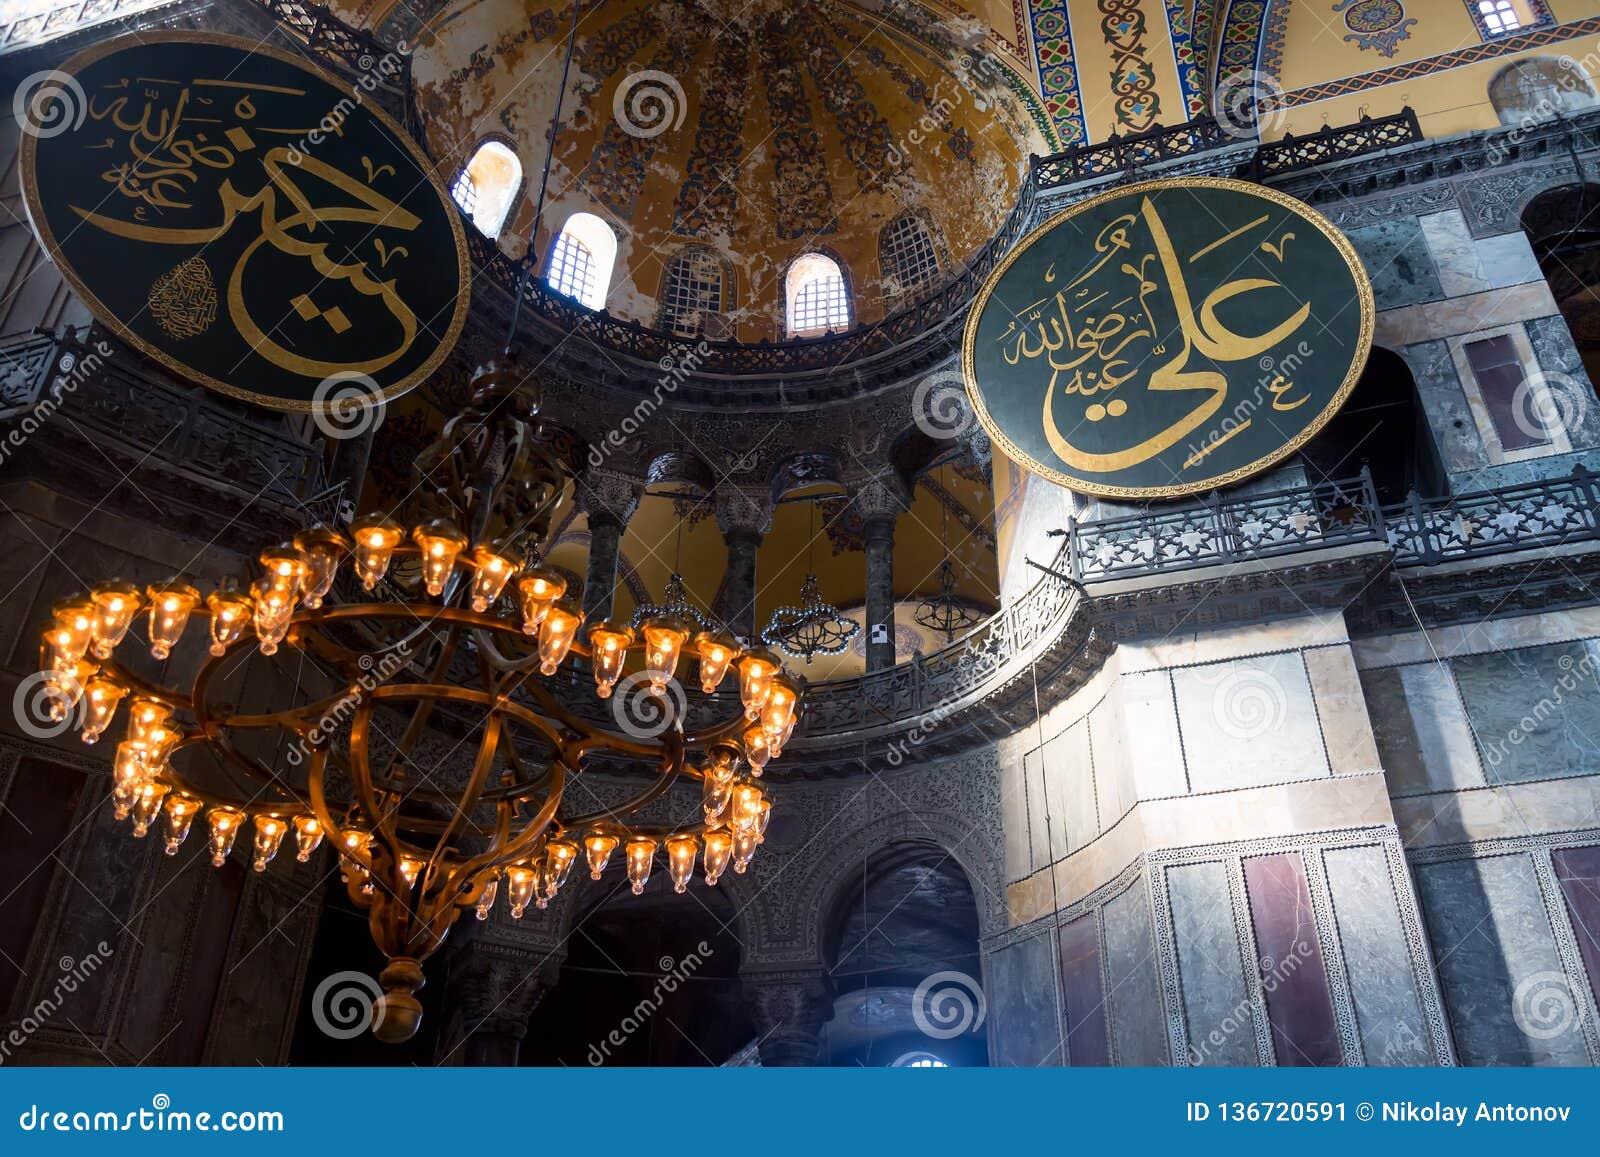 Hagia Sophia museum interior in Istanbul, Turkey. Hagia Sophia is the greatest monument and biggest Orthodox church of Byzantine